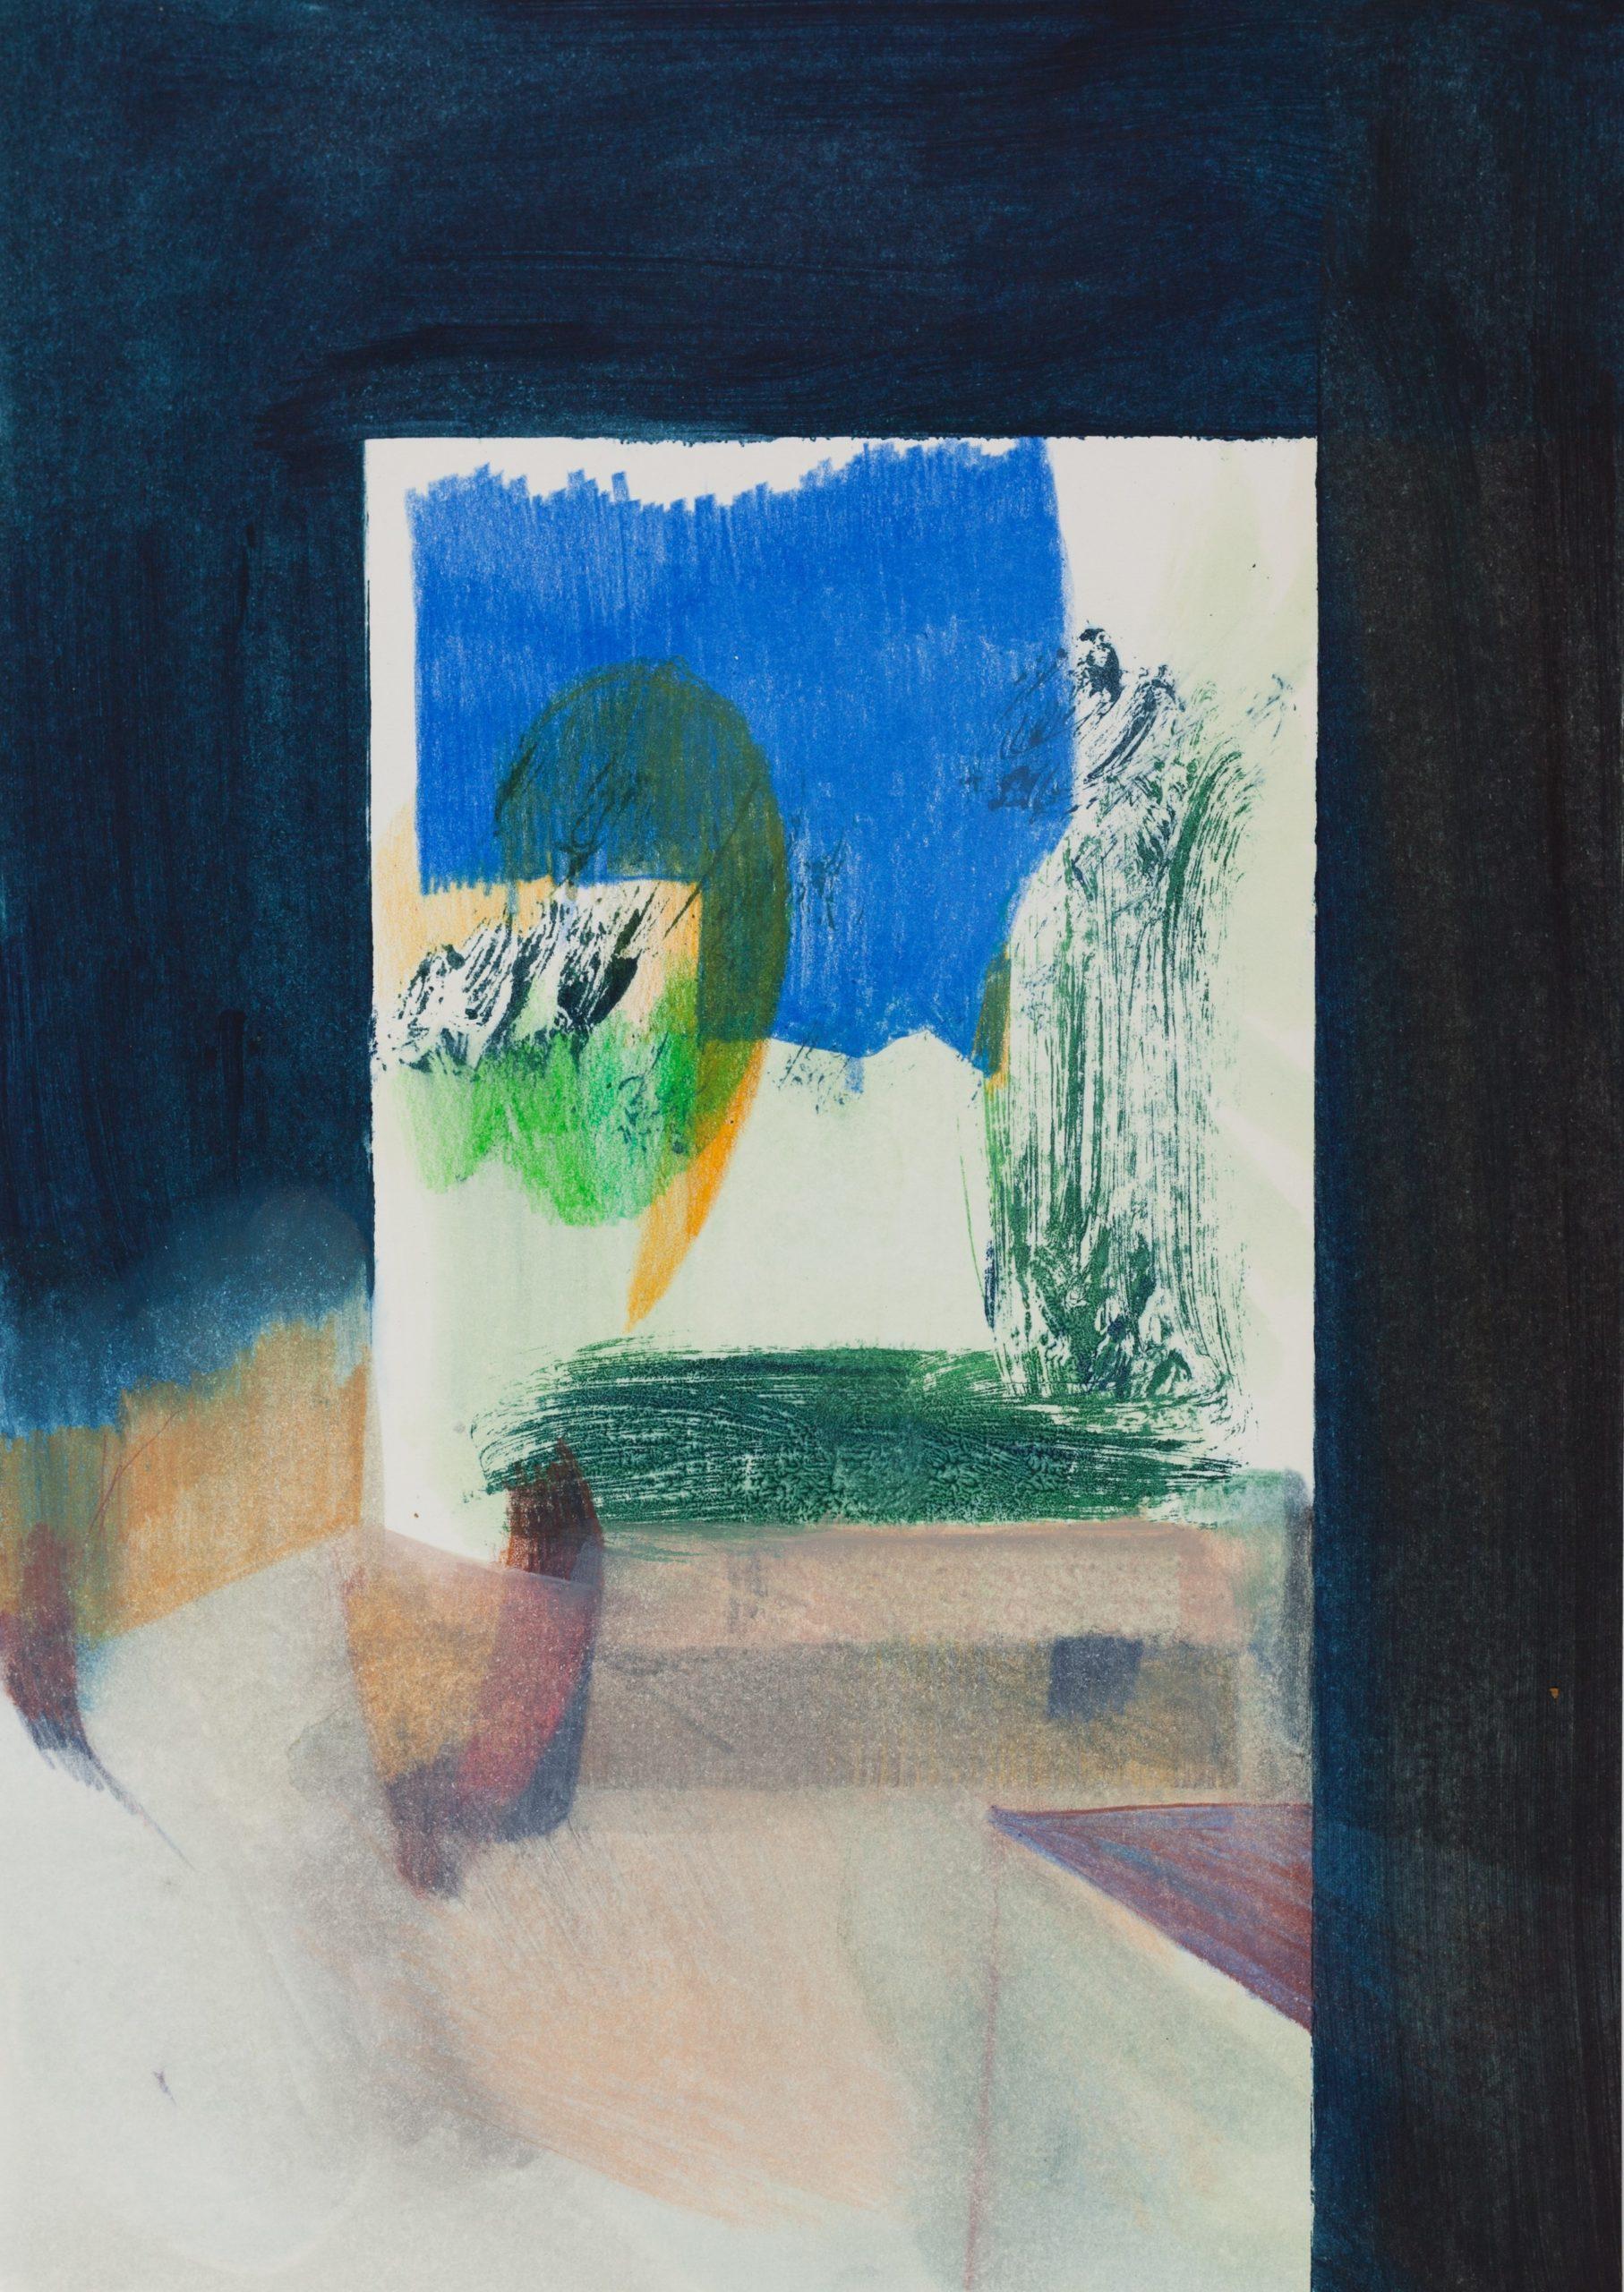 KNH-Tiny Gallery #6: Ilona Rainer-Pranter